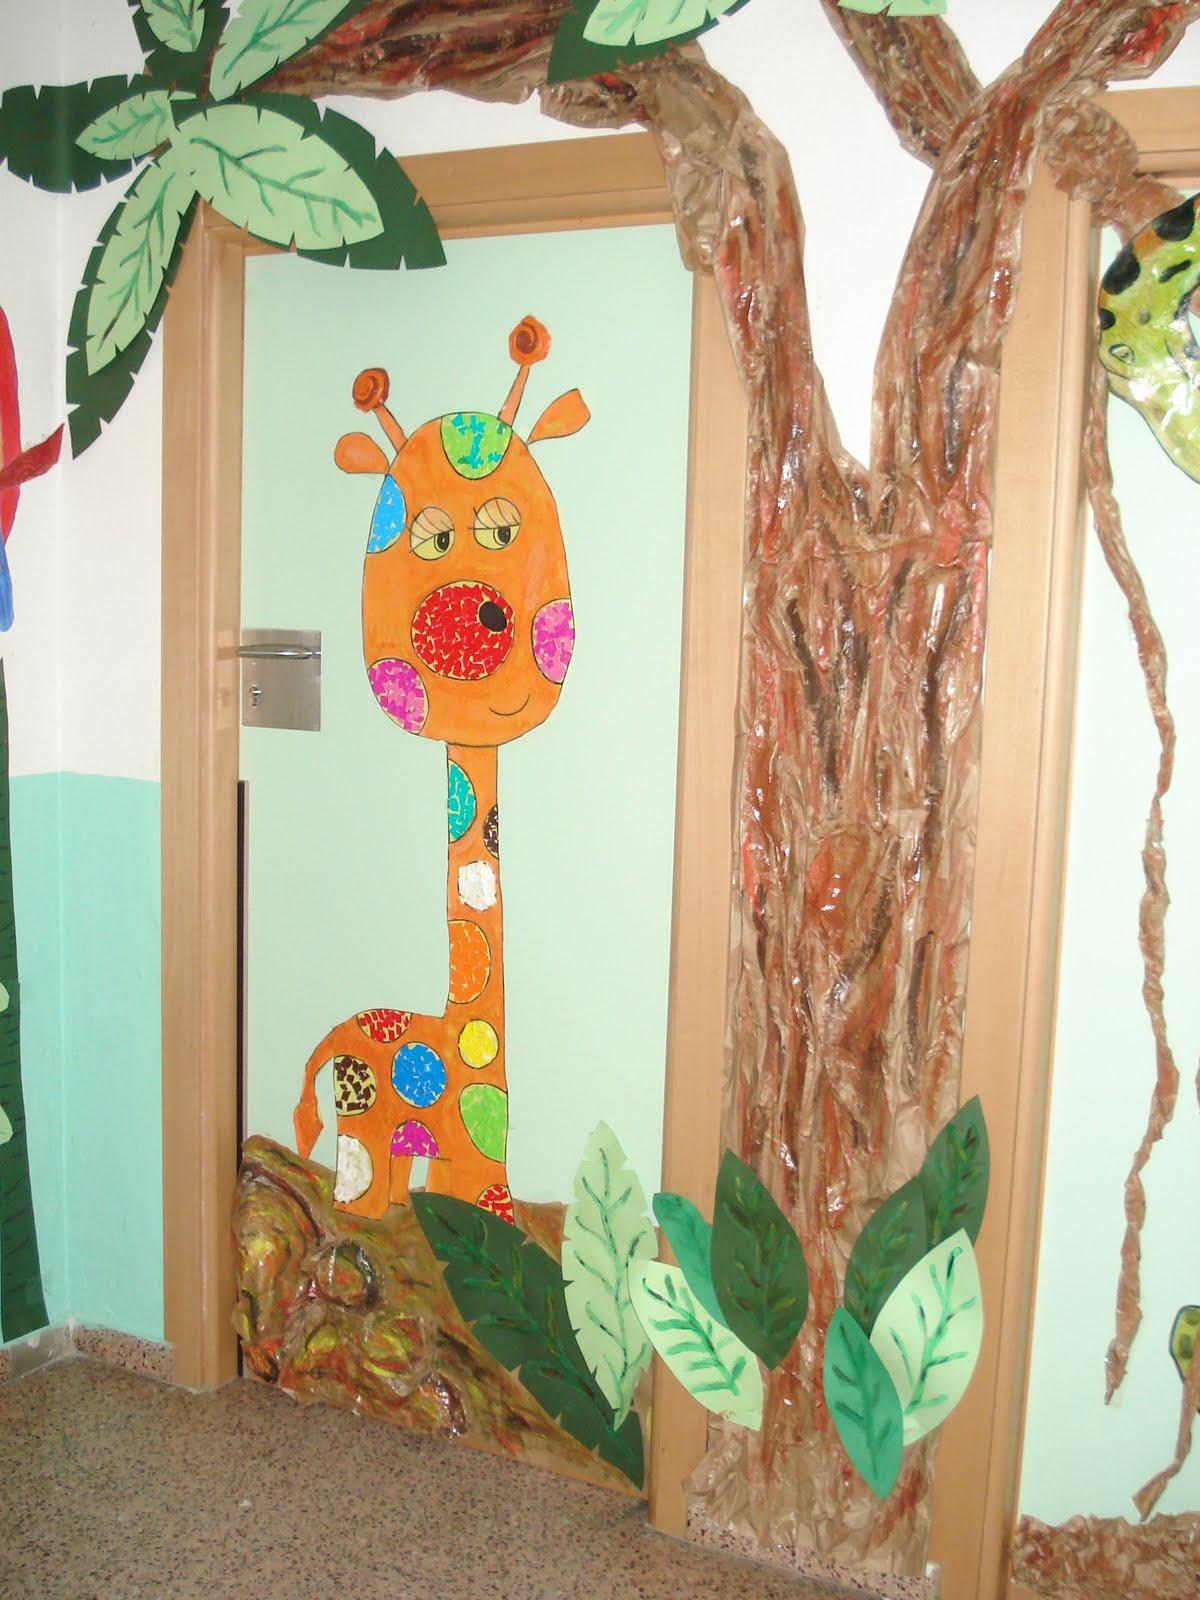 Recursos de educaci n infantil febrero 2011 for Puertas decoradas para guarderia